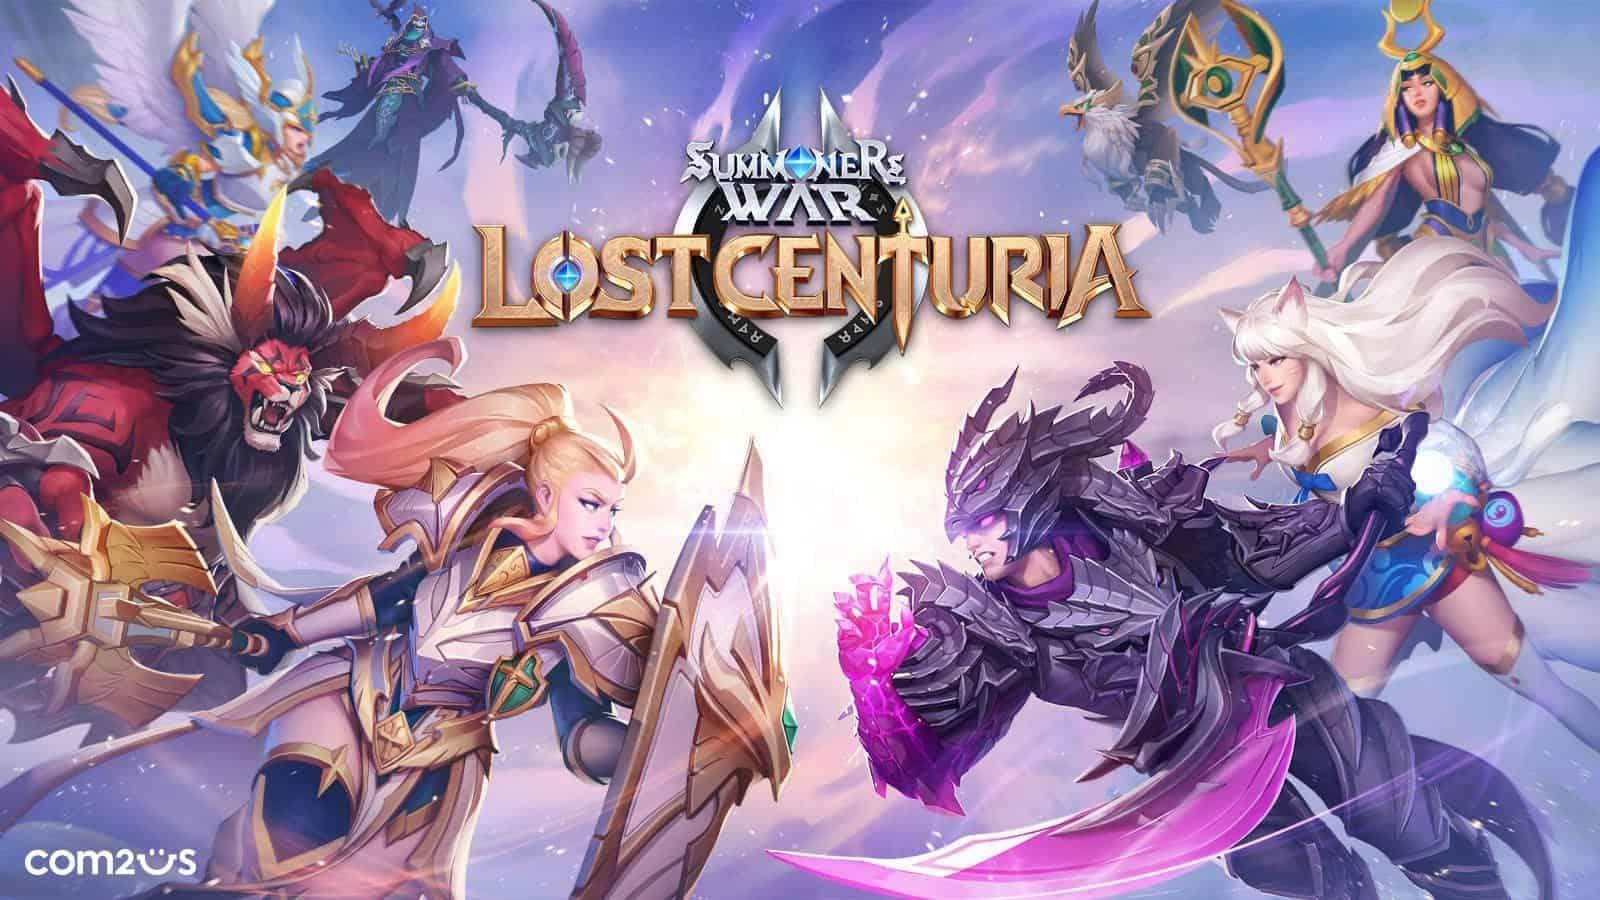 summoners war lost centuria tier list